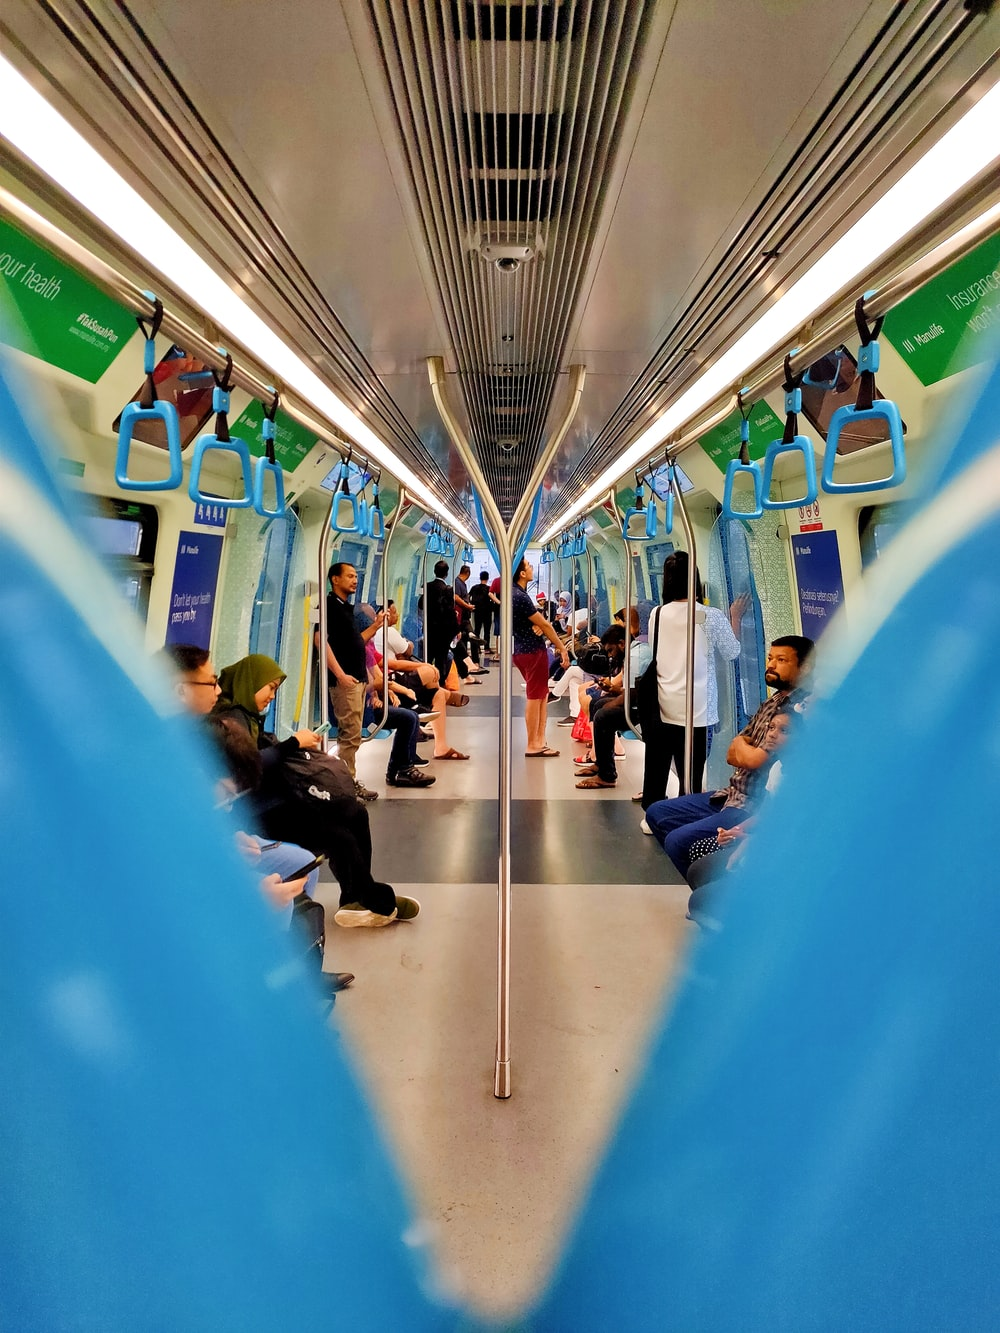 people riding inside train